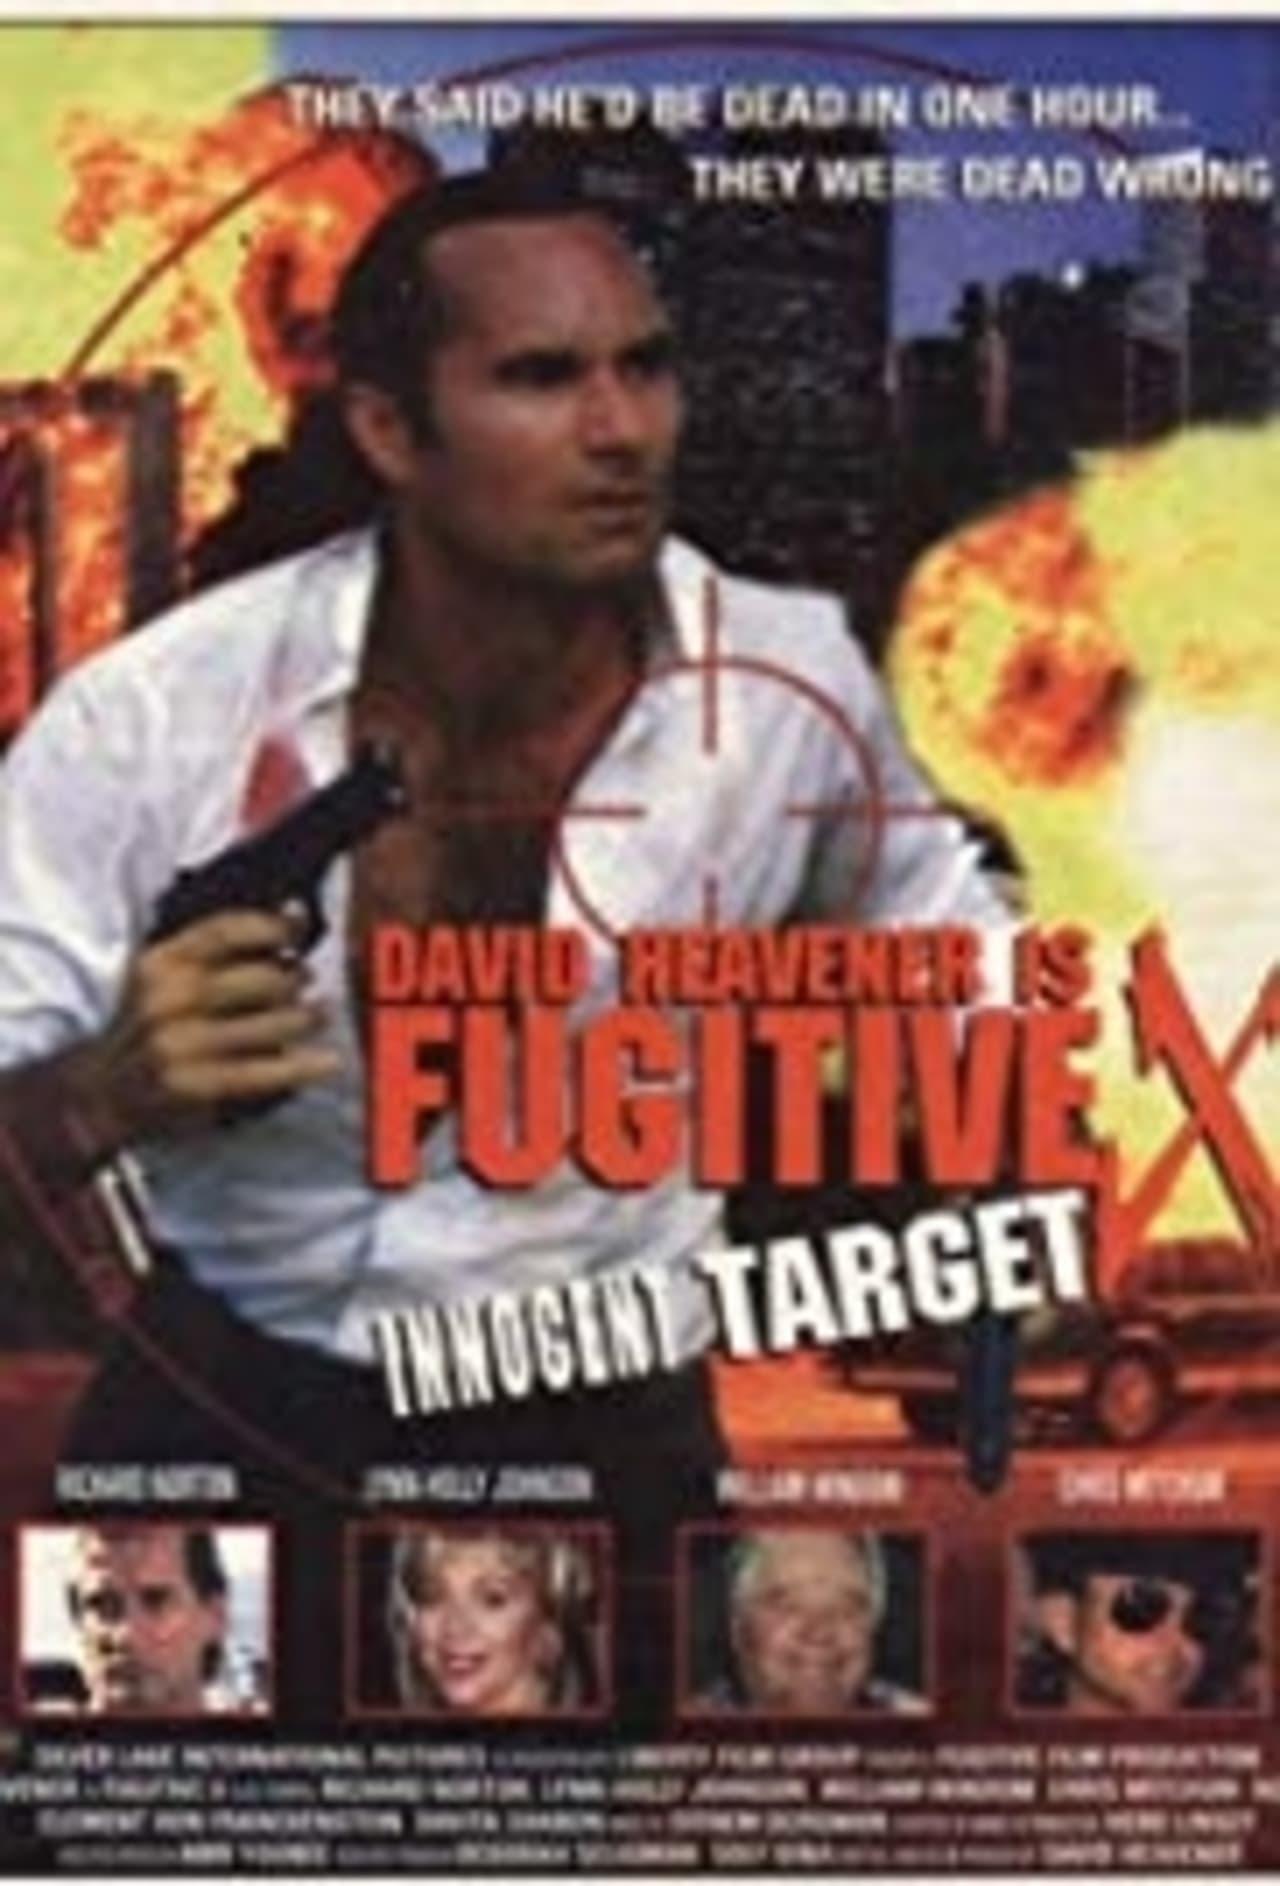 Fugitive X: Innocent Target